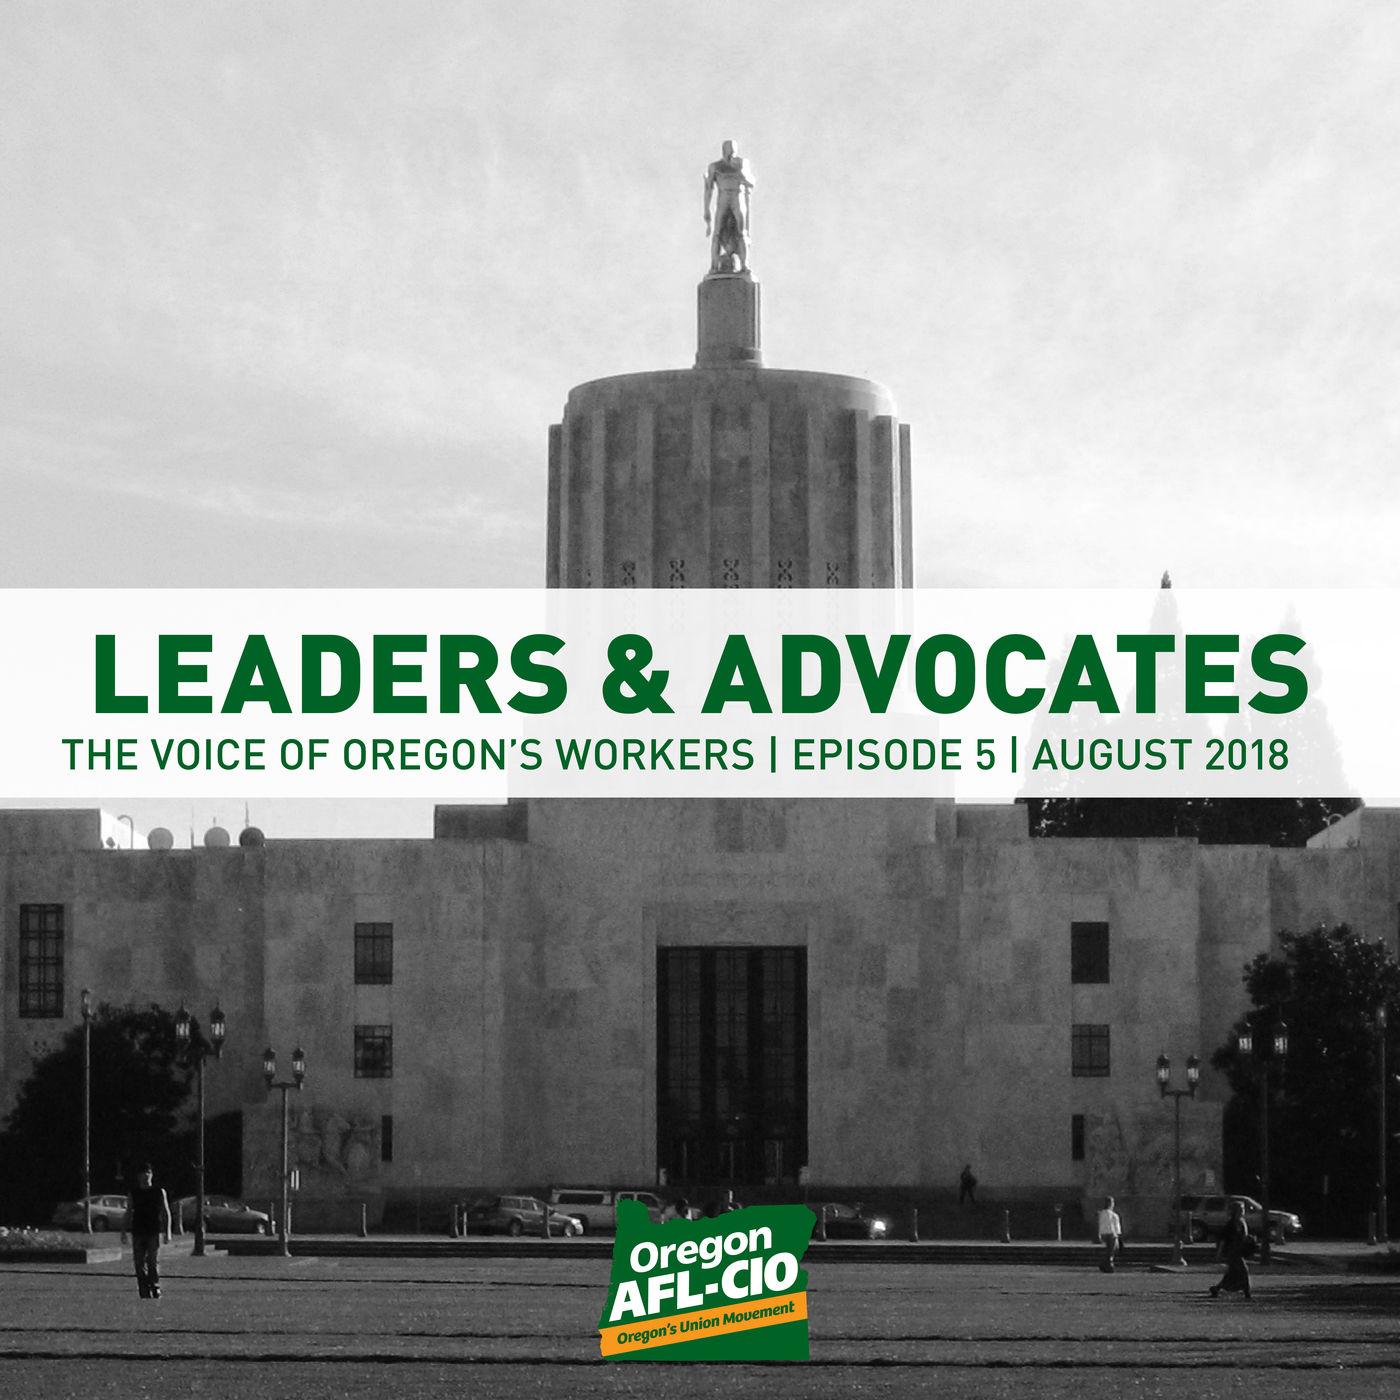 Leaders & Advocates